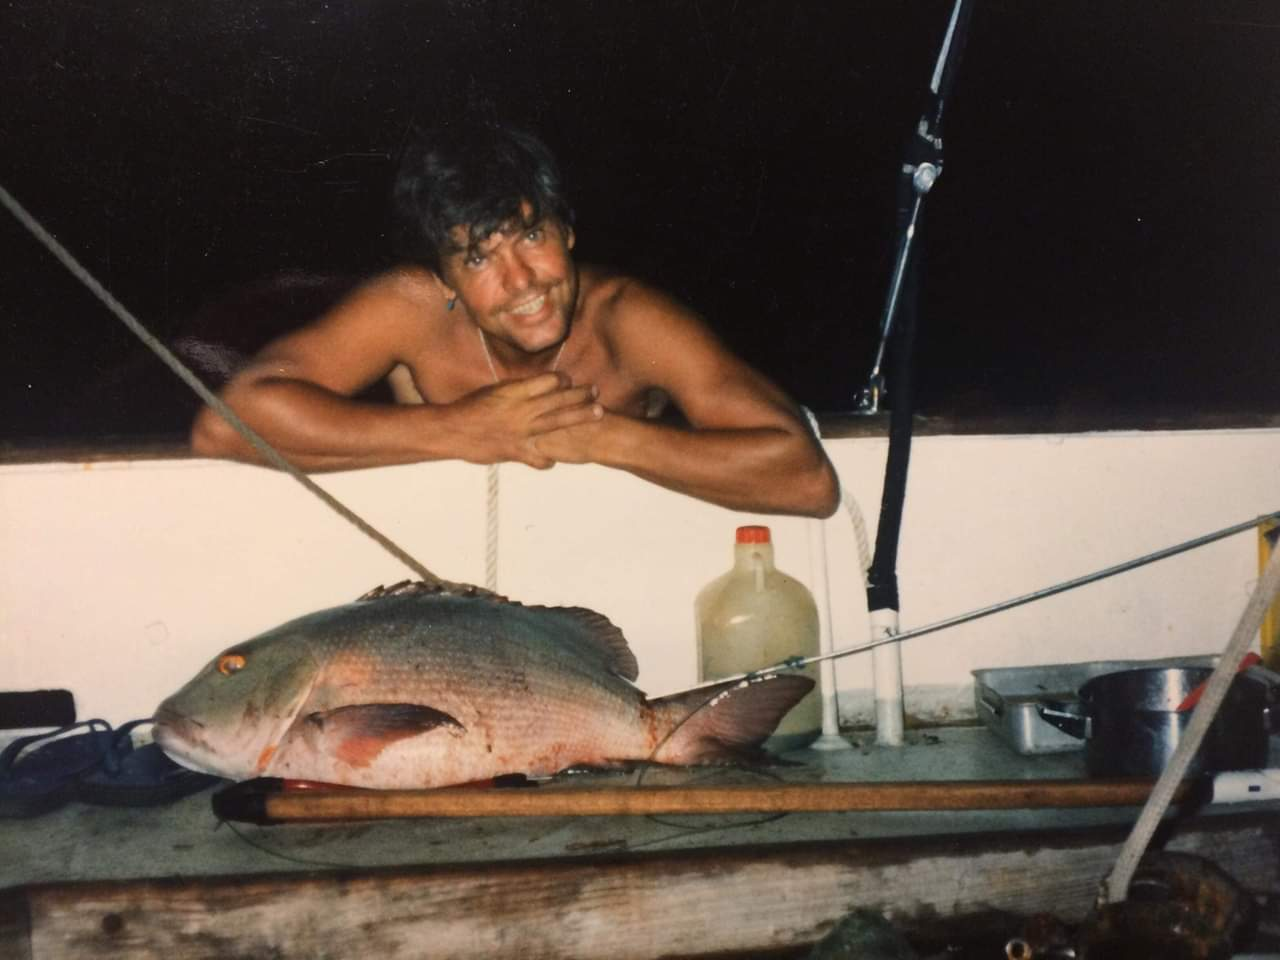 FB IMG 1567011278478 - Ib Michael - uvpodcast #47 - Mit liv som undervandsjæger